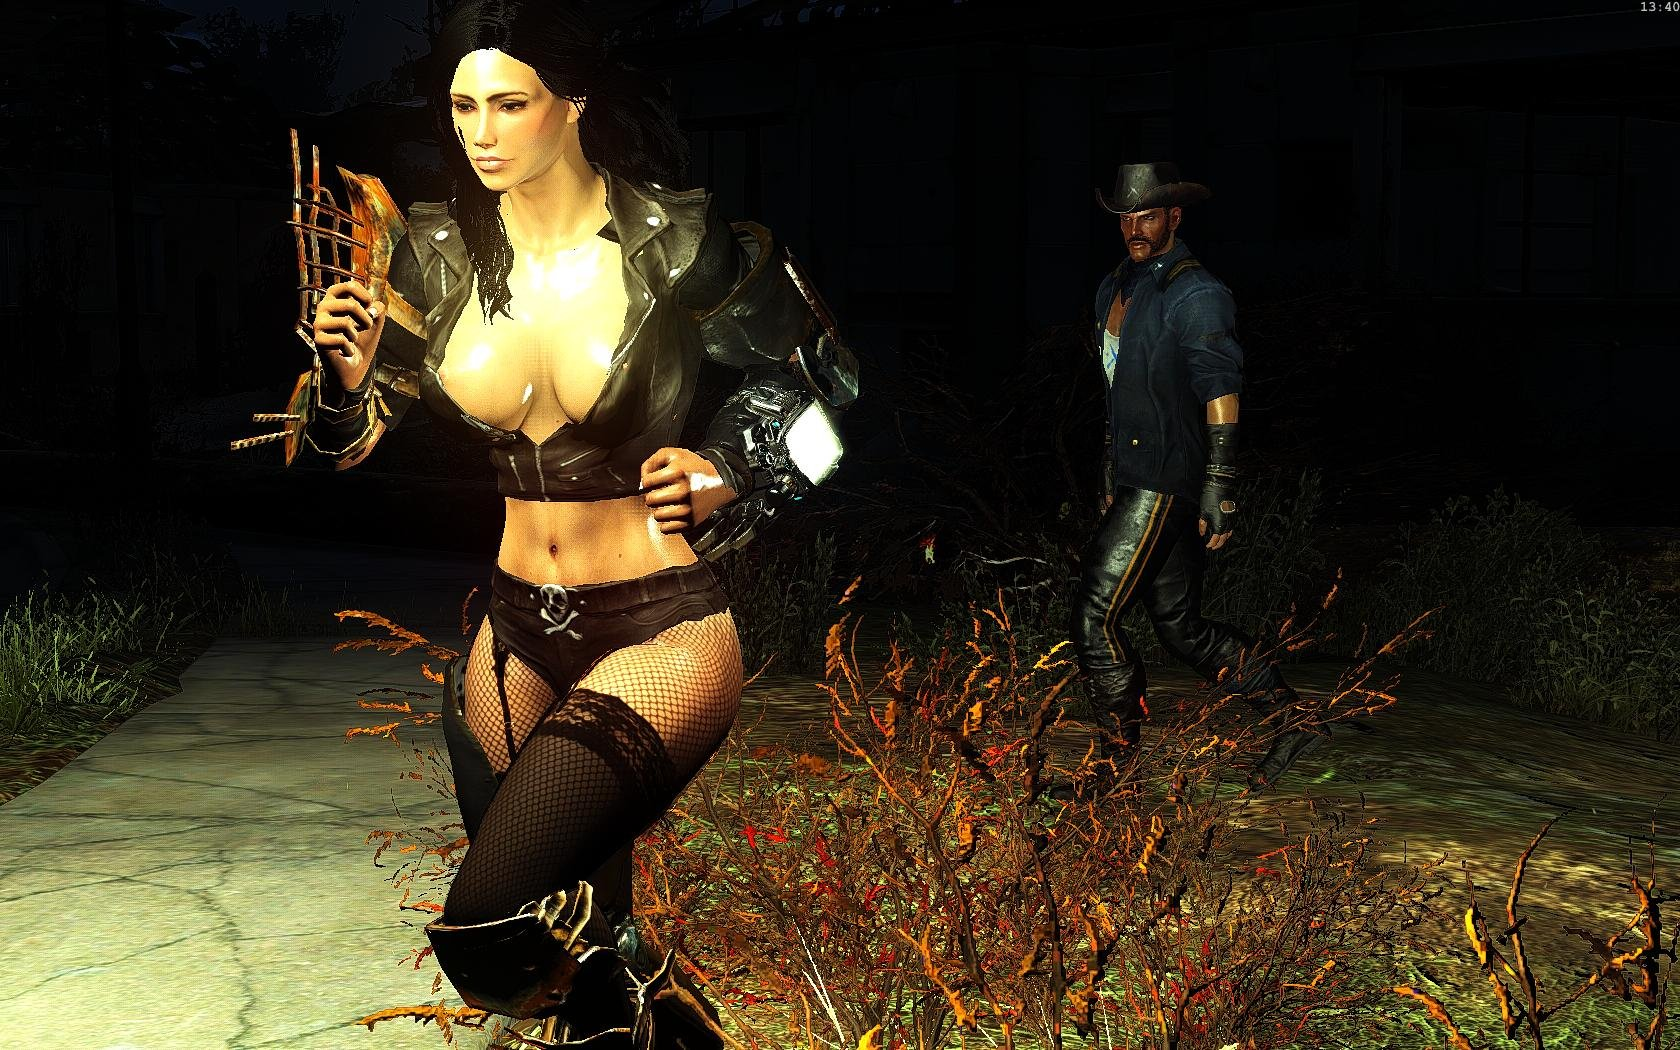 Fallout4 2019-01-20 13-40-16-22